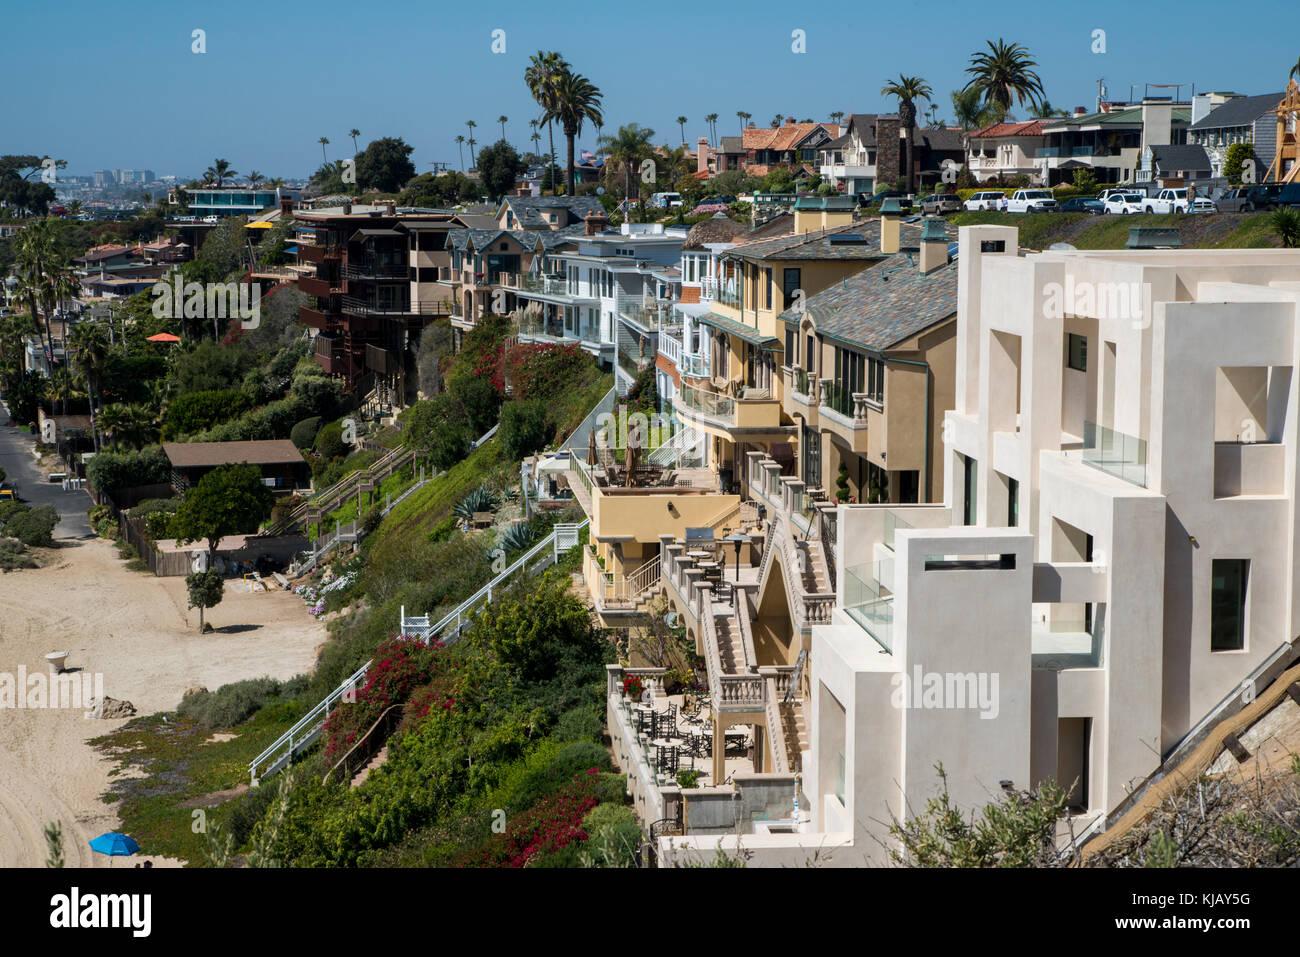 Newport Beach, California. The neighborhood of Corona Del Mar.  Expensive houses line the beach along the  the Pacific - Stock Image